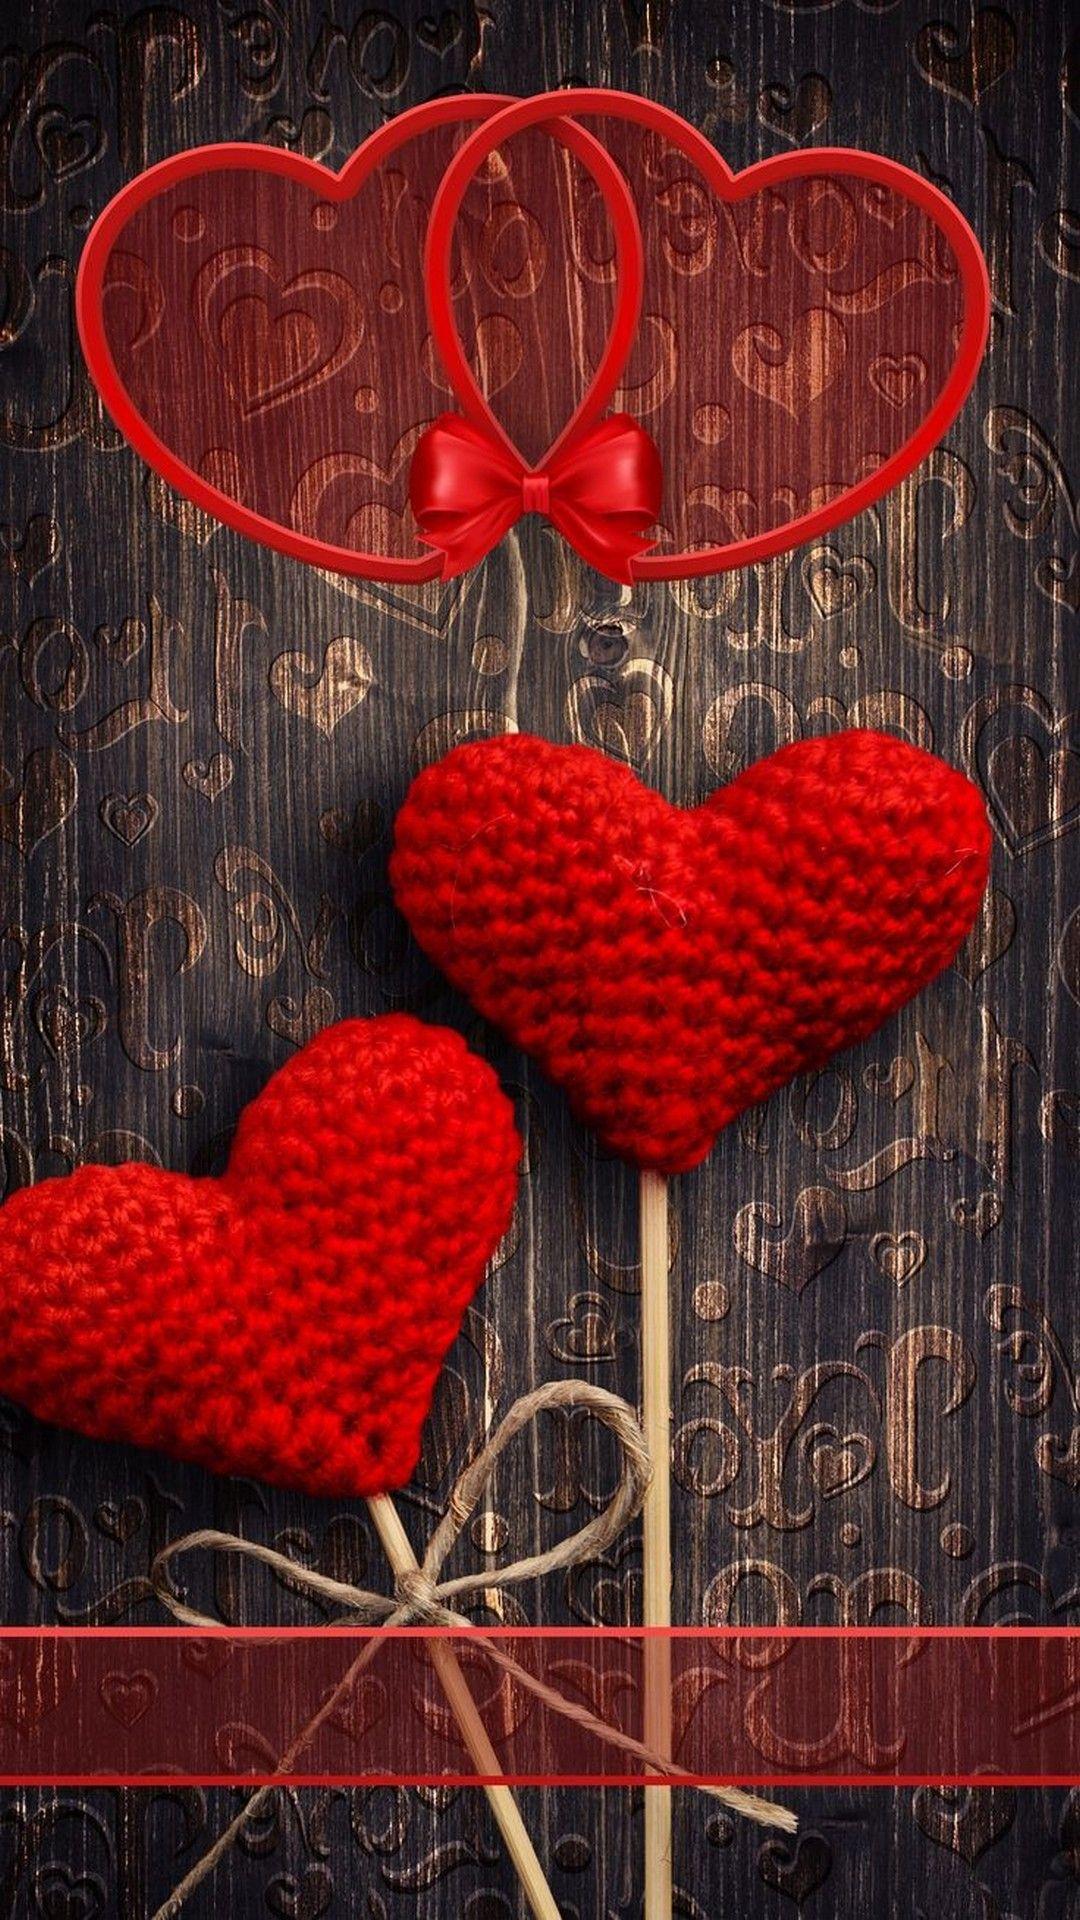 Cute Stickers Phone Wallpaper Best Phone Wallpaper Heart Iphone Wallpaper Iphone Wallpaper Images Best Iphone Wallpapers